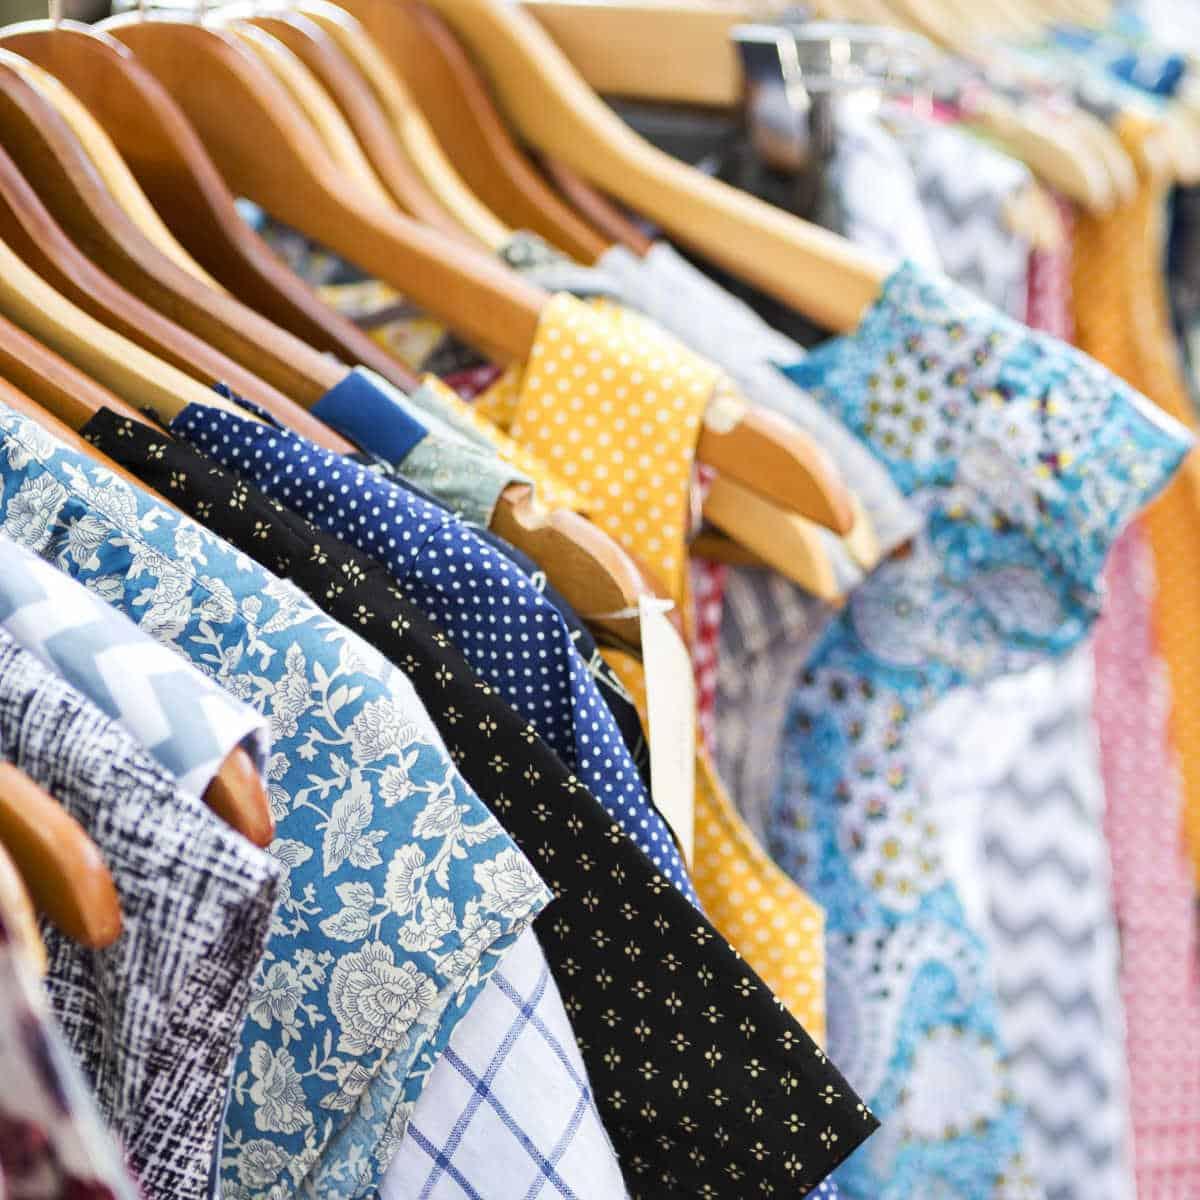 thrift store womens clothing on racks.